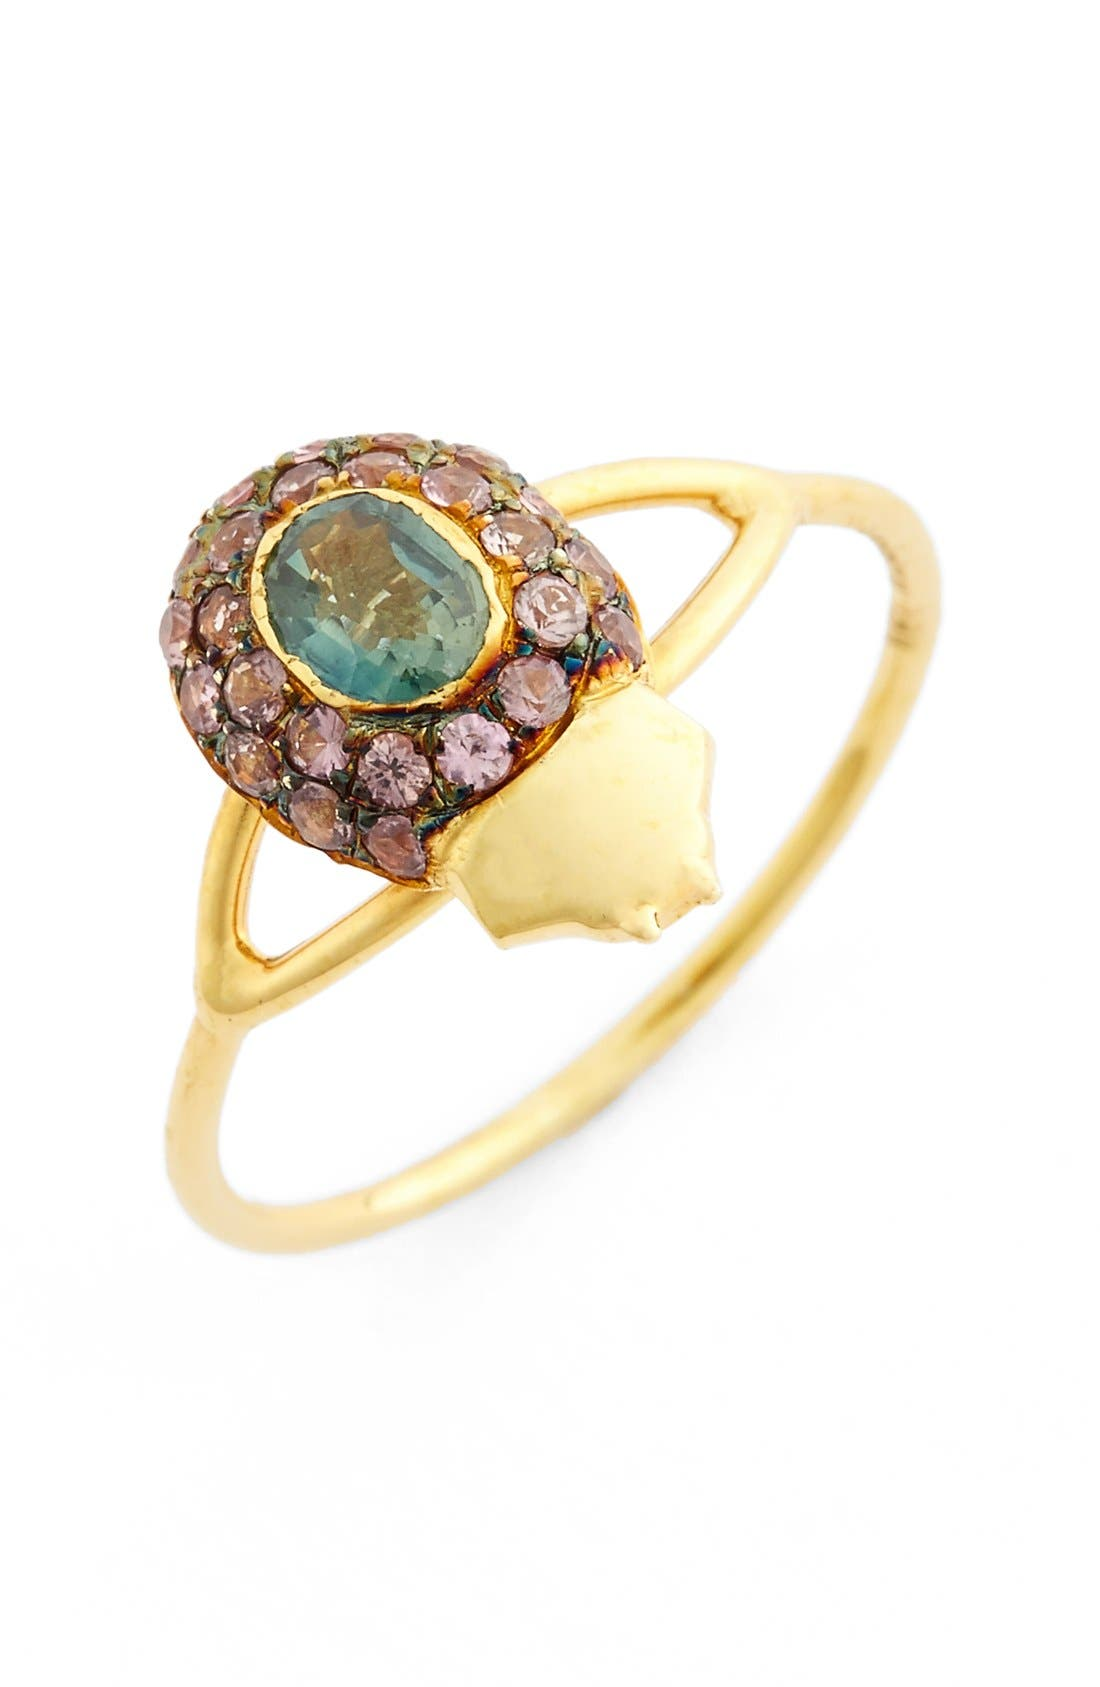 'Maat' Sapphire Ring,                             Main thumbnail 1, color,                             710